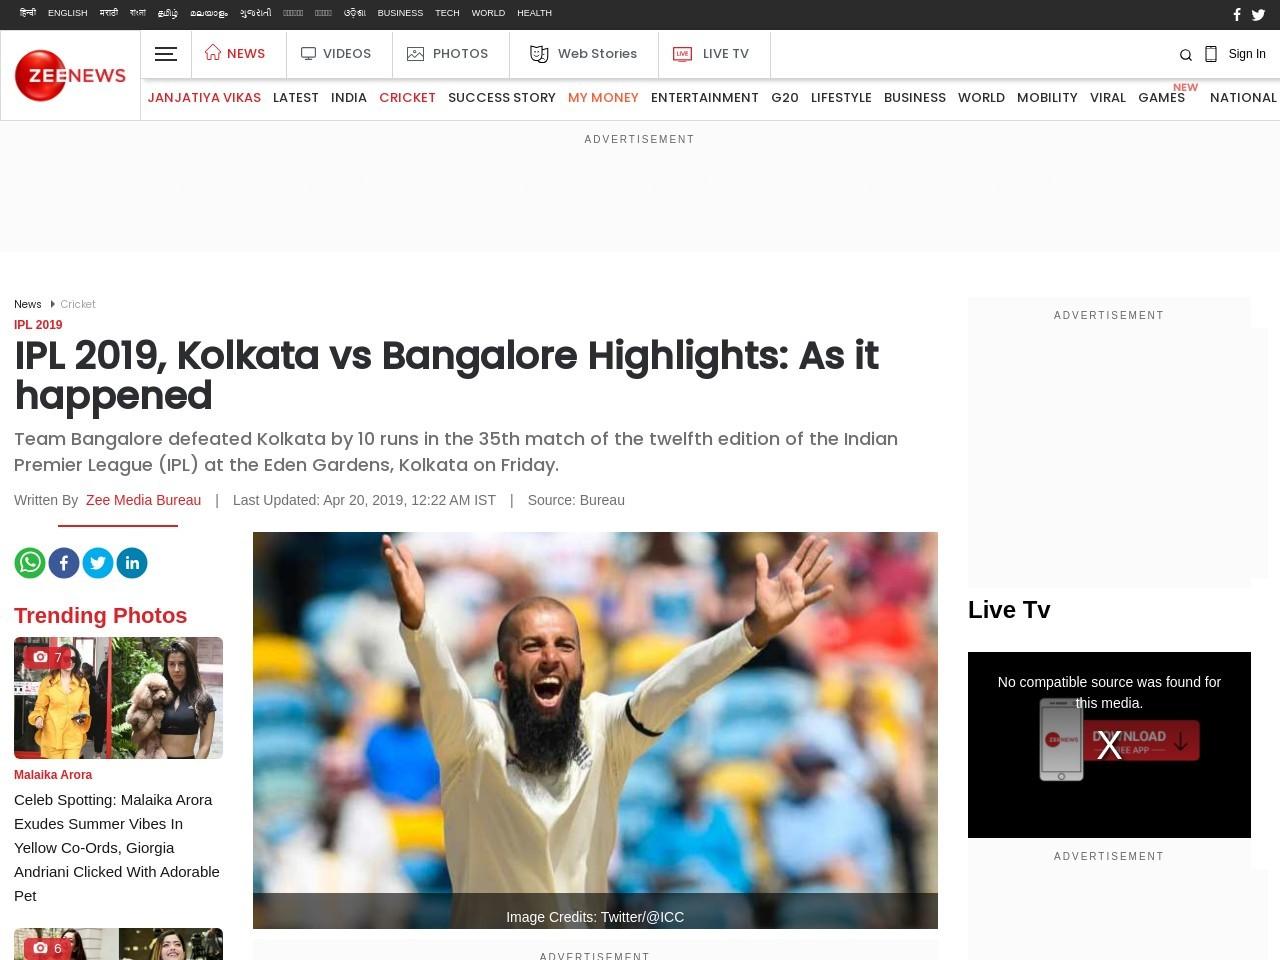 IPL 2019, Kolkata vs Bangalore Highlights: As it happened